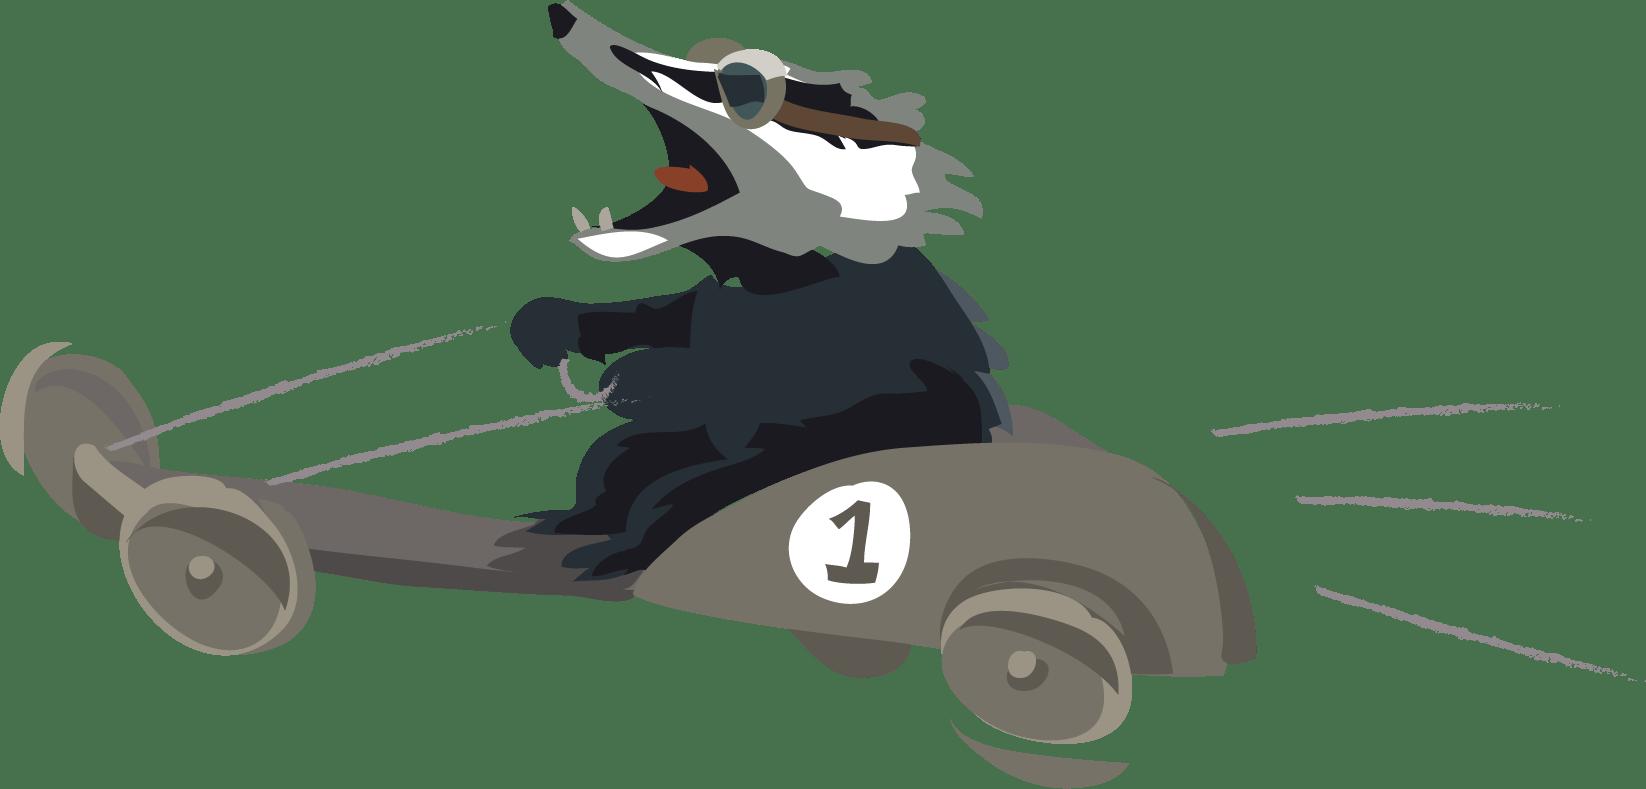 a badger drives a go kart